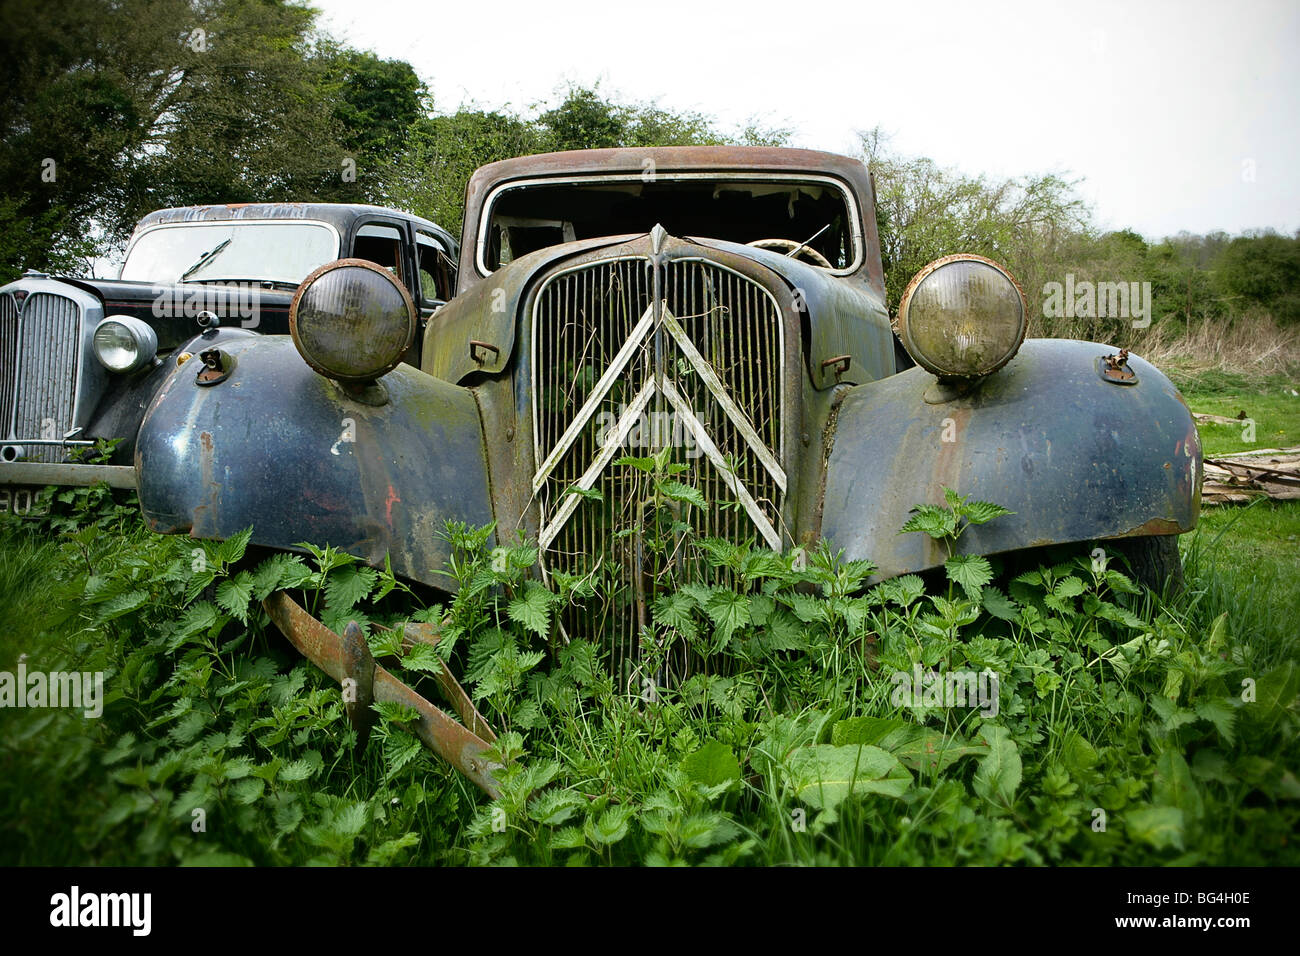 Abandoned classic Citroen Traction Avant car - Stock Image